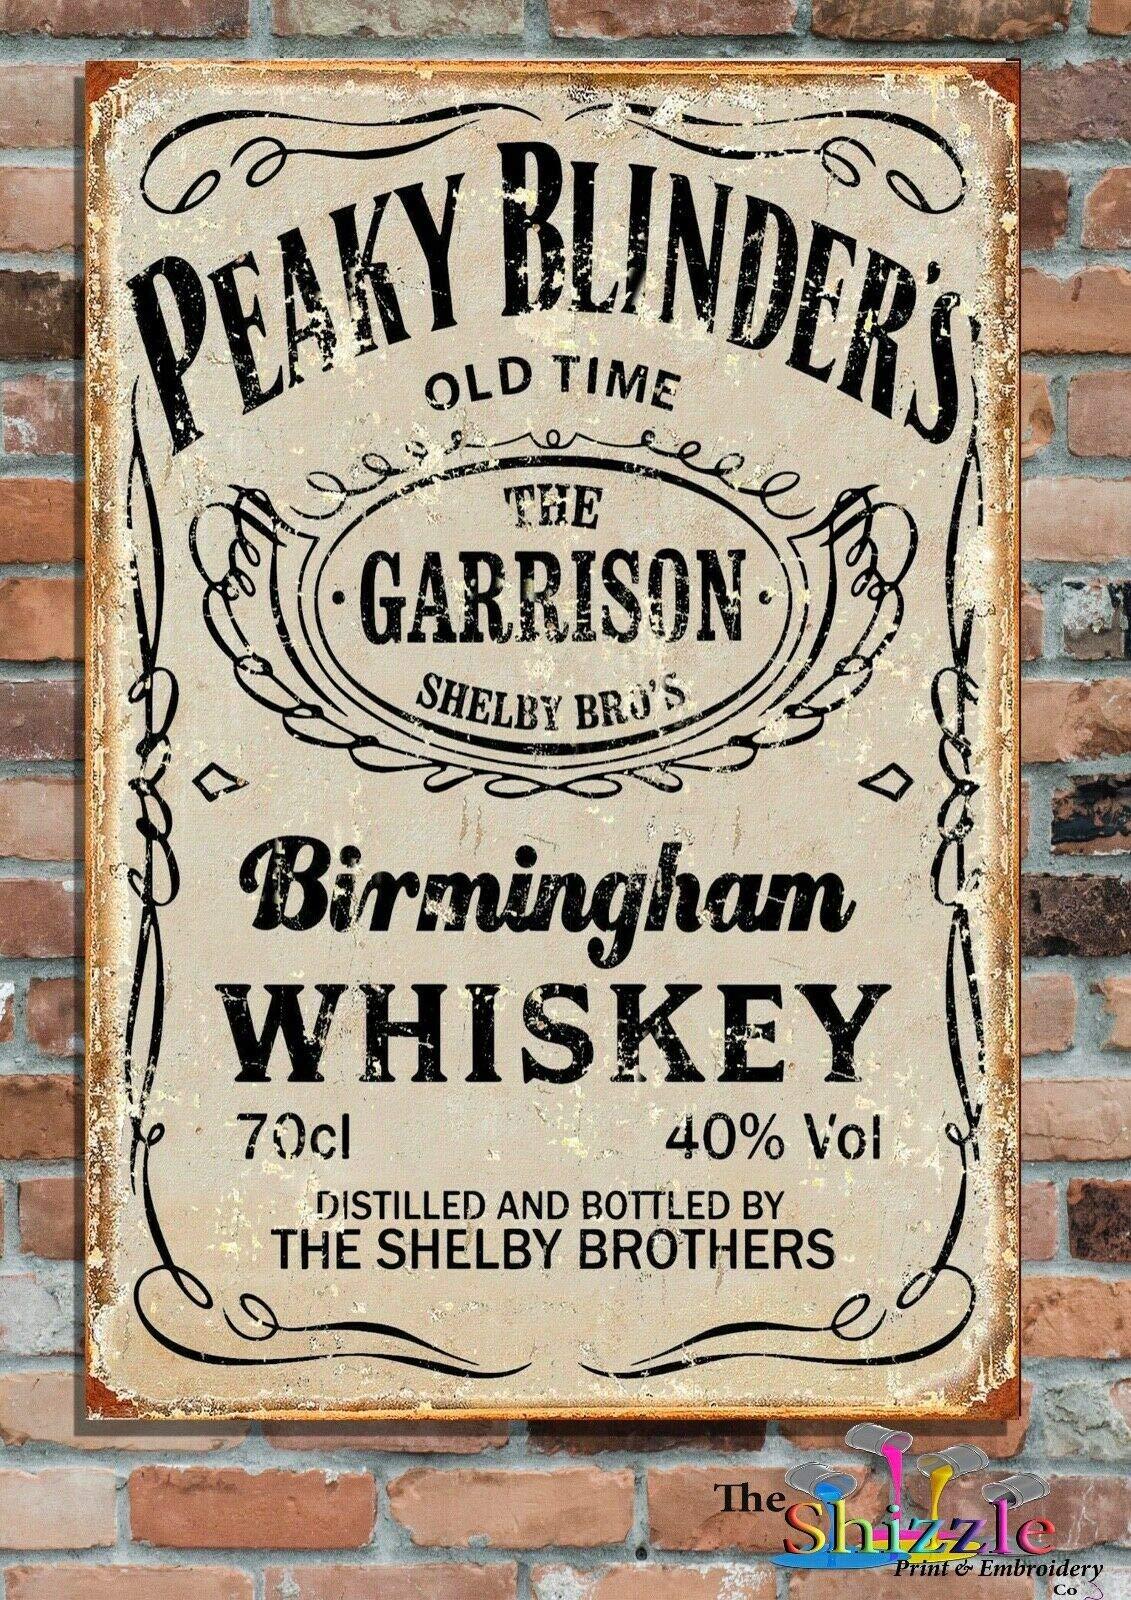 Garrison Peaky Blinders виски на заказ Старые Металлические Рекламные Знаки-2 размера Ретро настенный домашний бар паб винтажный Декор для кафе, 8x12 дюй...